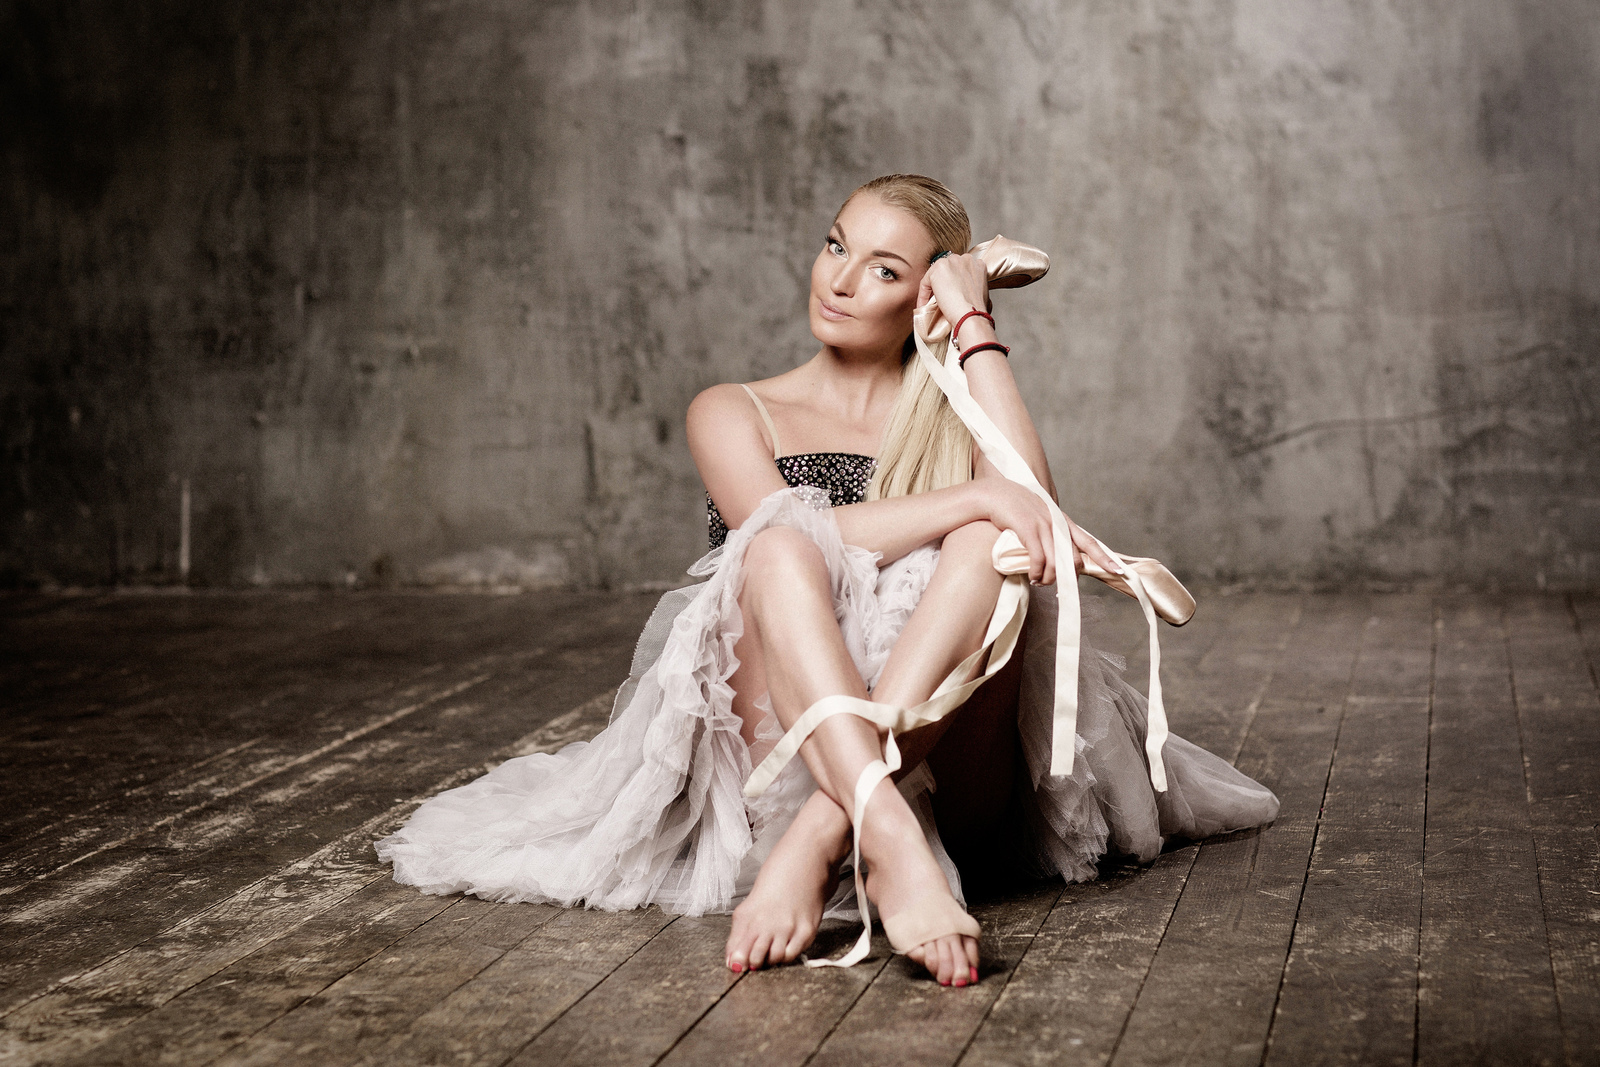 Анастасия Волочкова балет